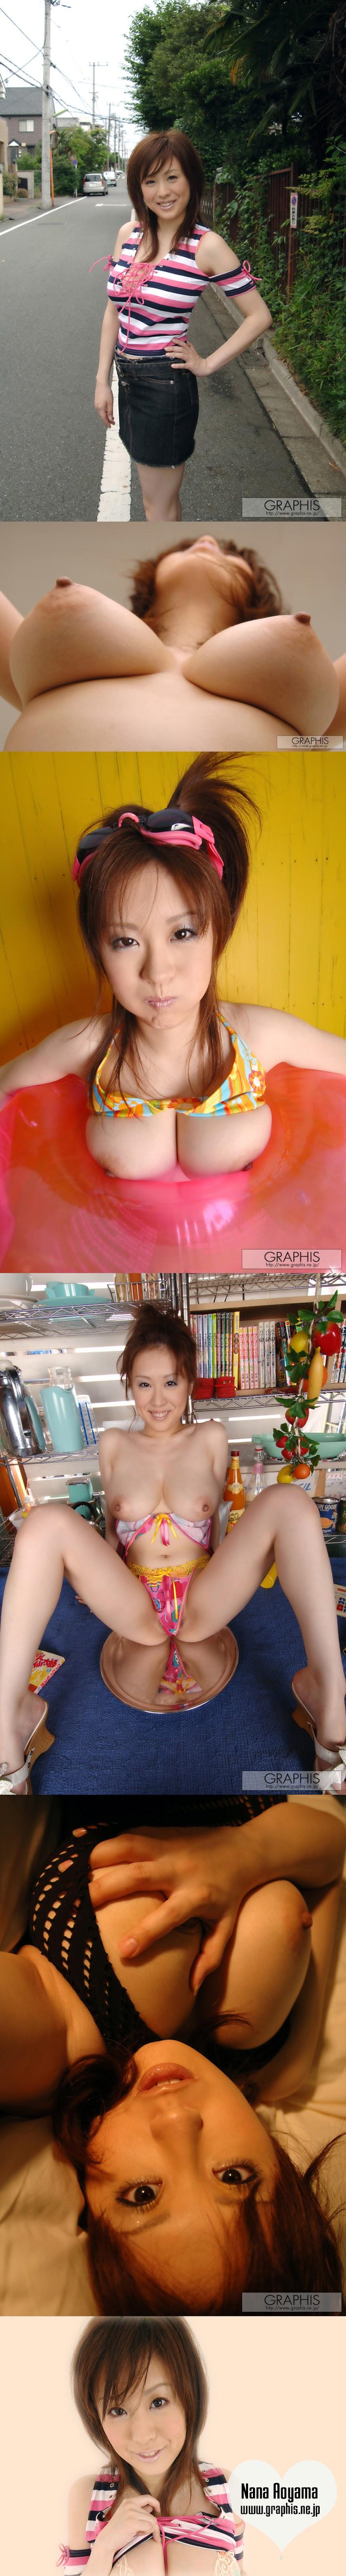 Graphis__Gals_No.123_Nana_Aoyama_%25E9%259D%2592%25E5%25B1%25B1%25E8%258F%259C%25E3%2580%2585_Personal_experience.zip-jk- Graphis  Gals No.123 Nana Aoyama 青山菜々 Personal experience graphis 10060